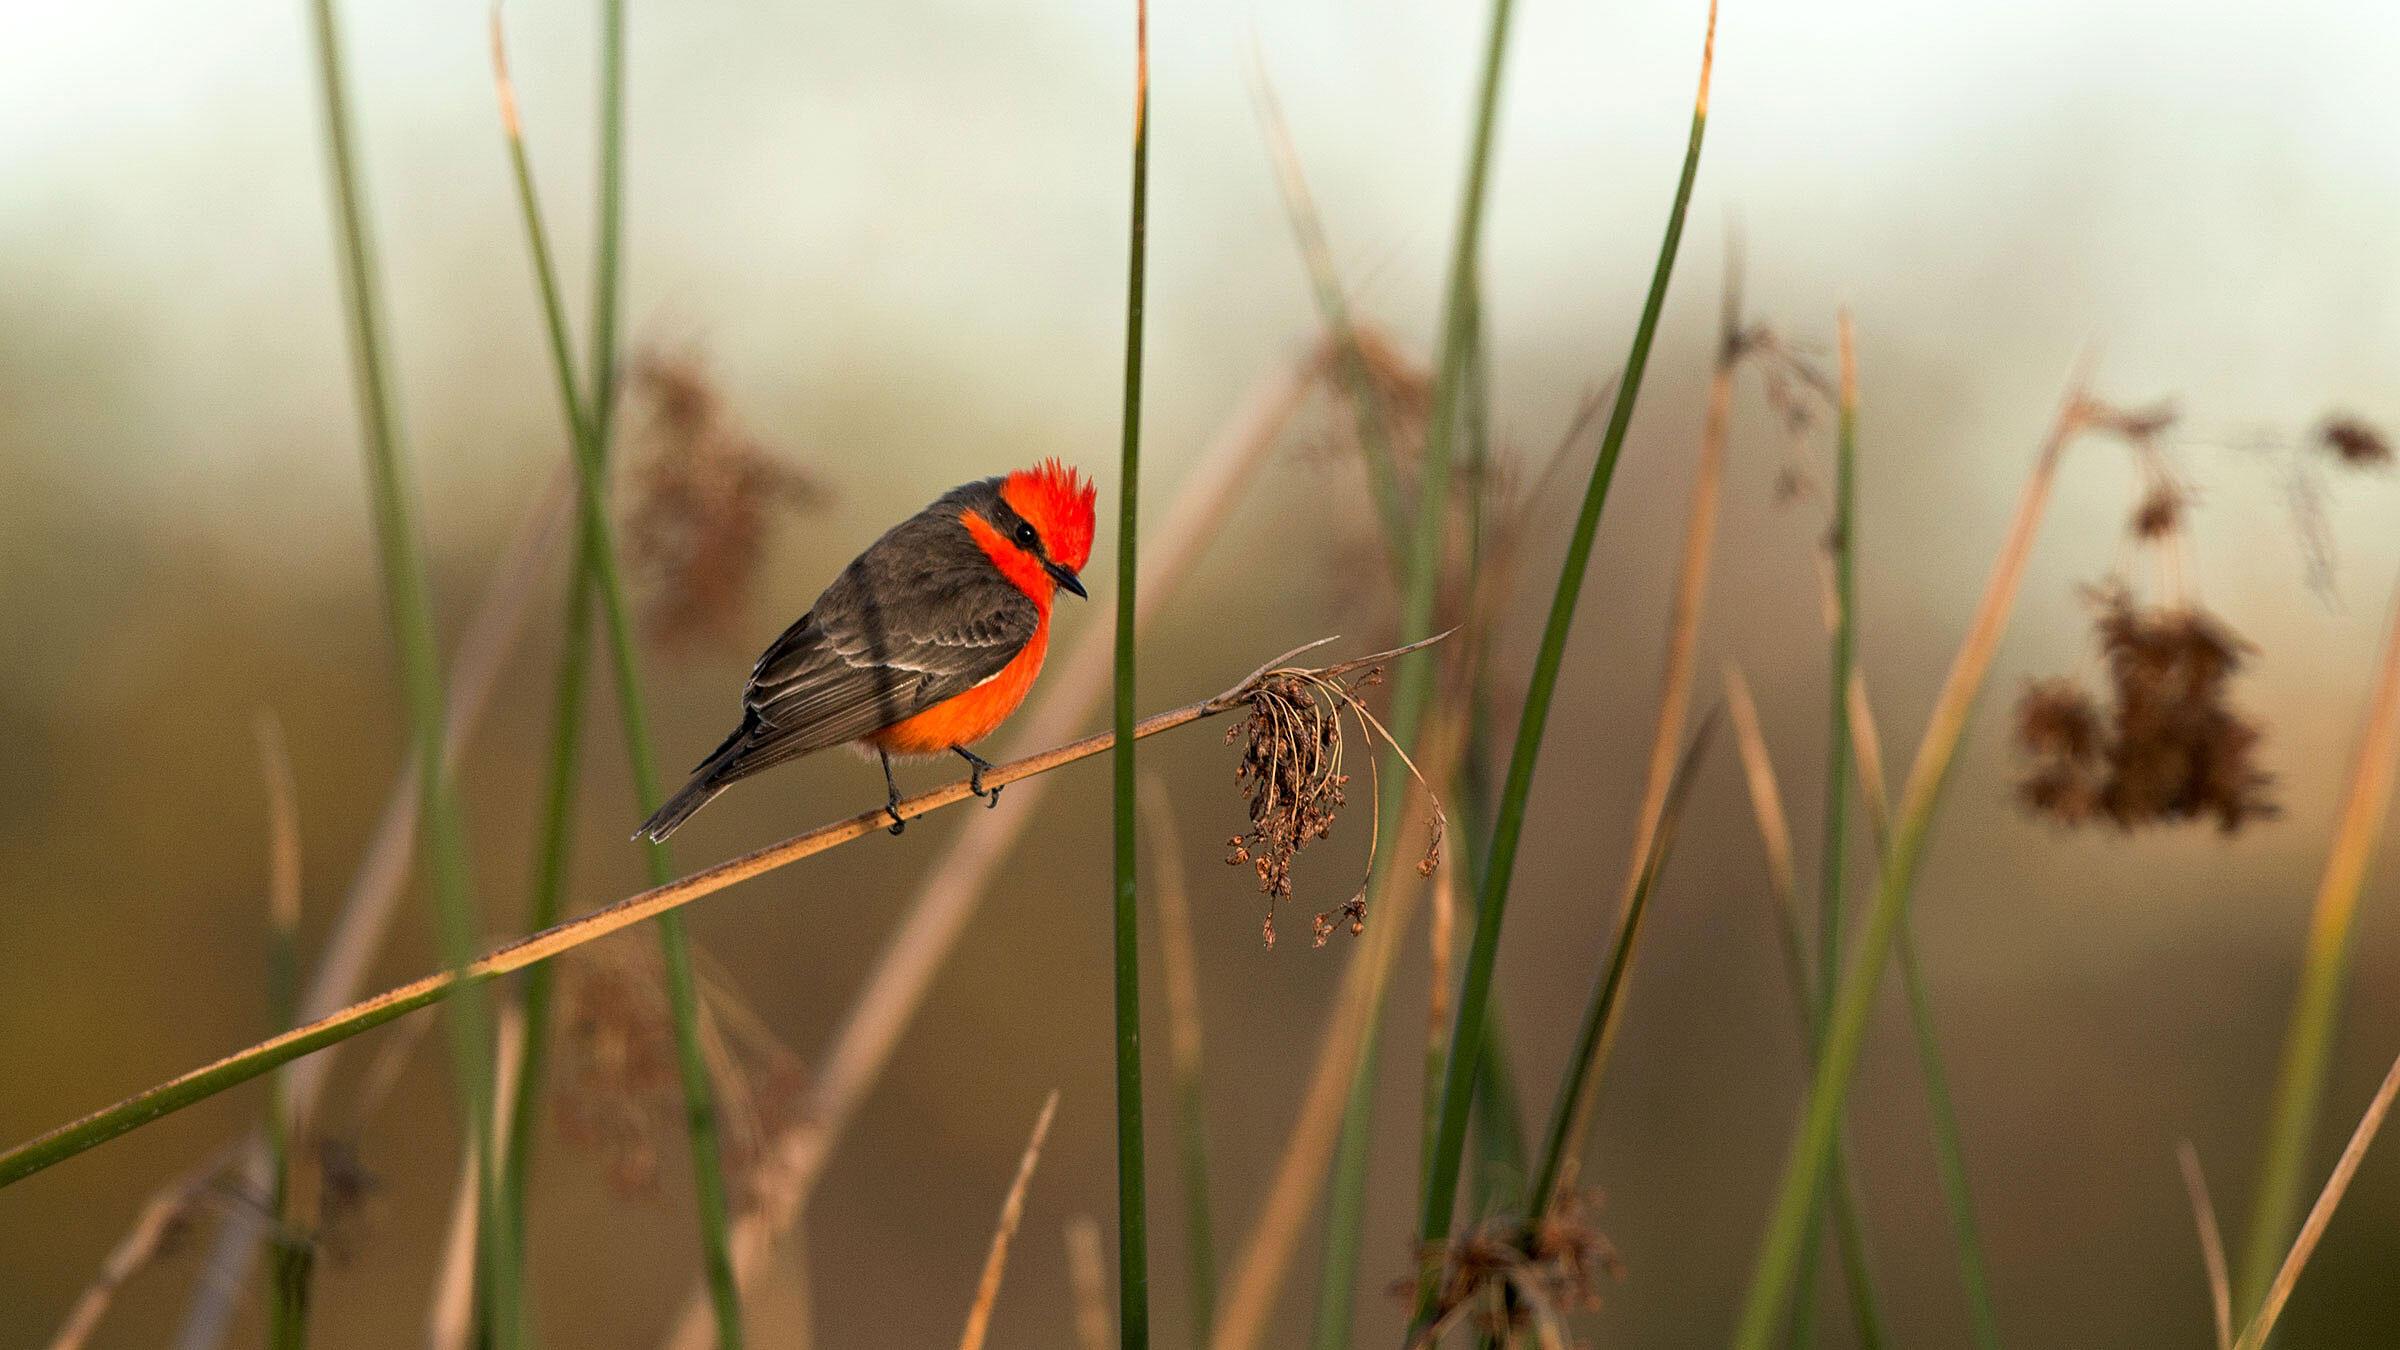 Vermilion Flycatchers and other red birds have a secret hidden within their genetic makeup. Sandrine Biziaux-Scherson/Audubon Photography Awards